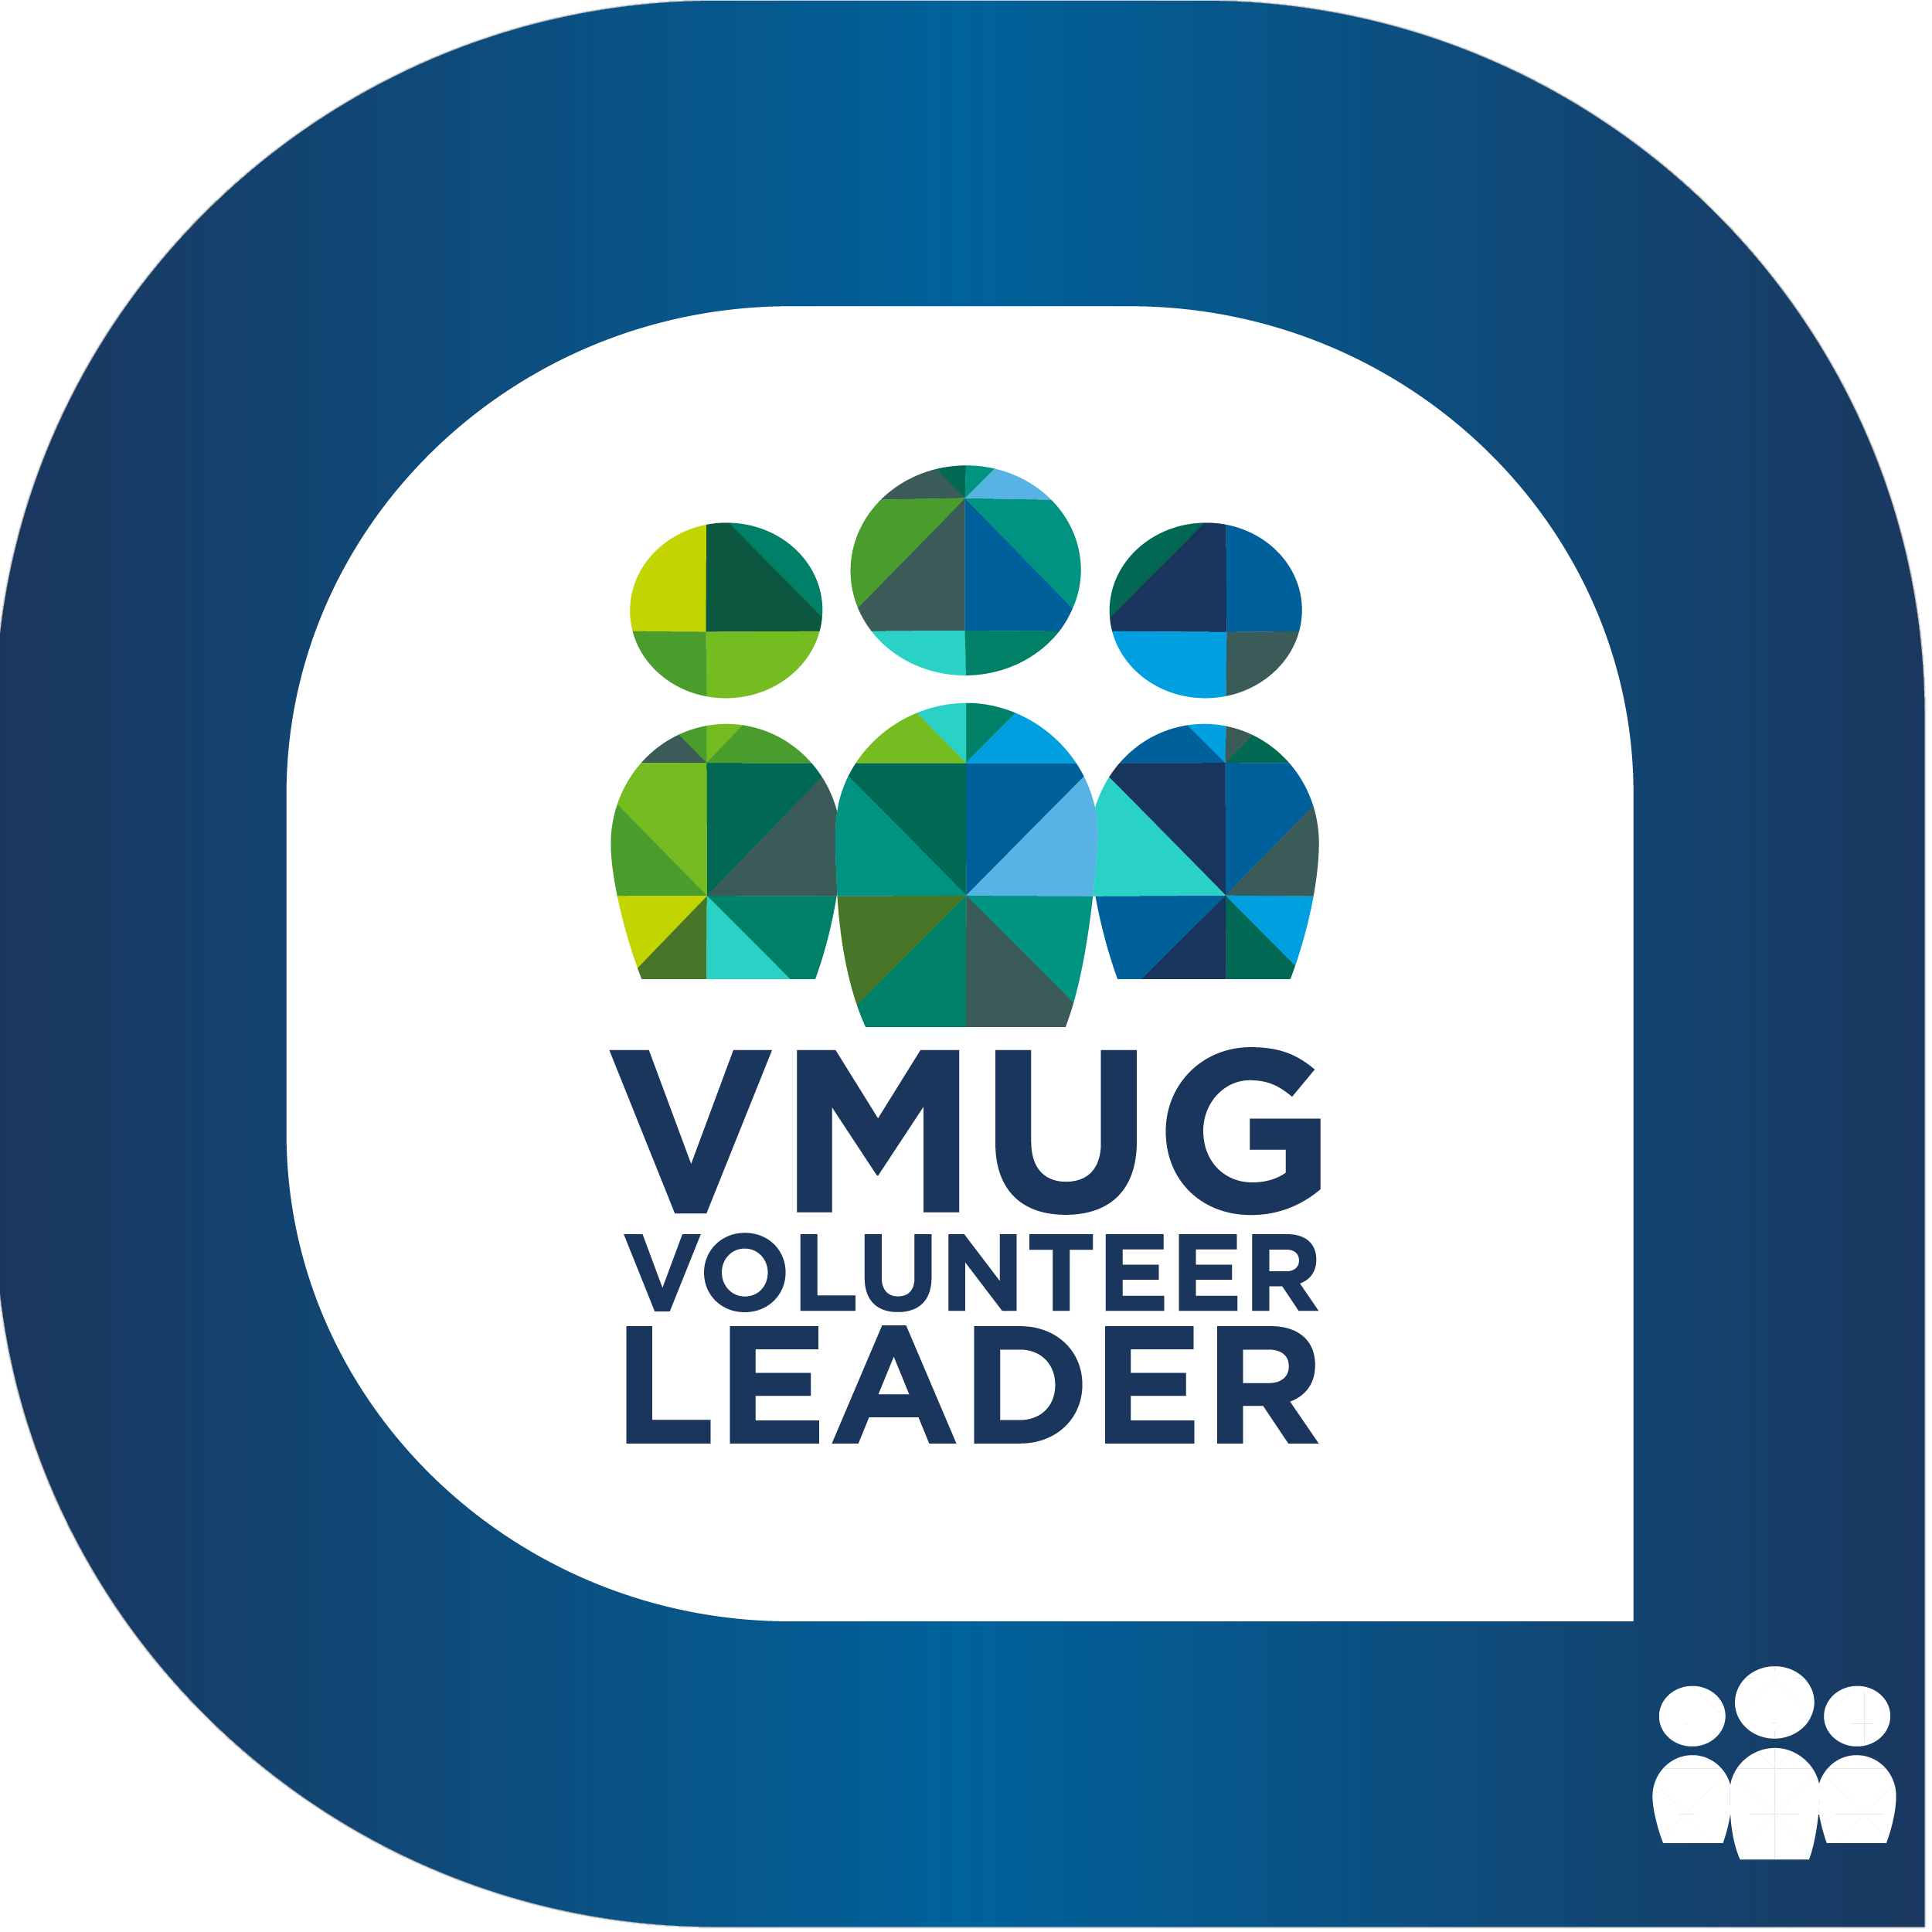 VMUG Leader